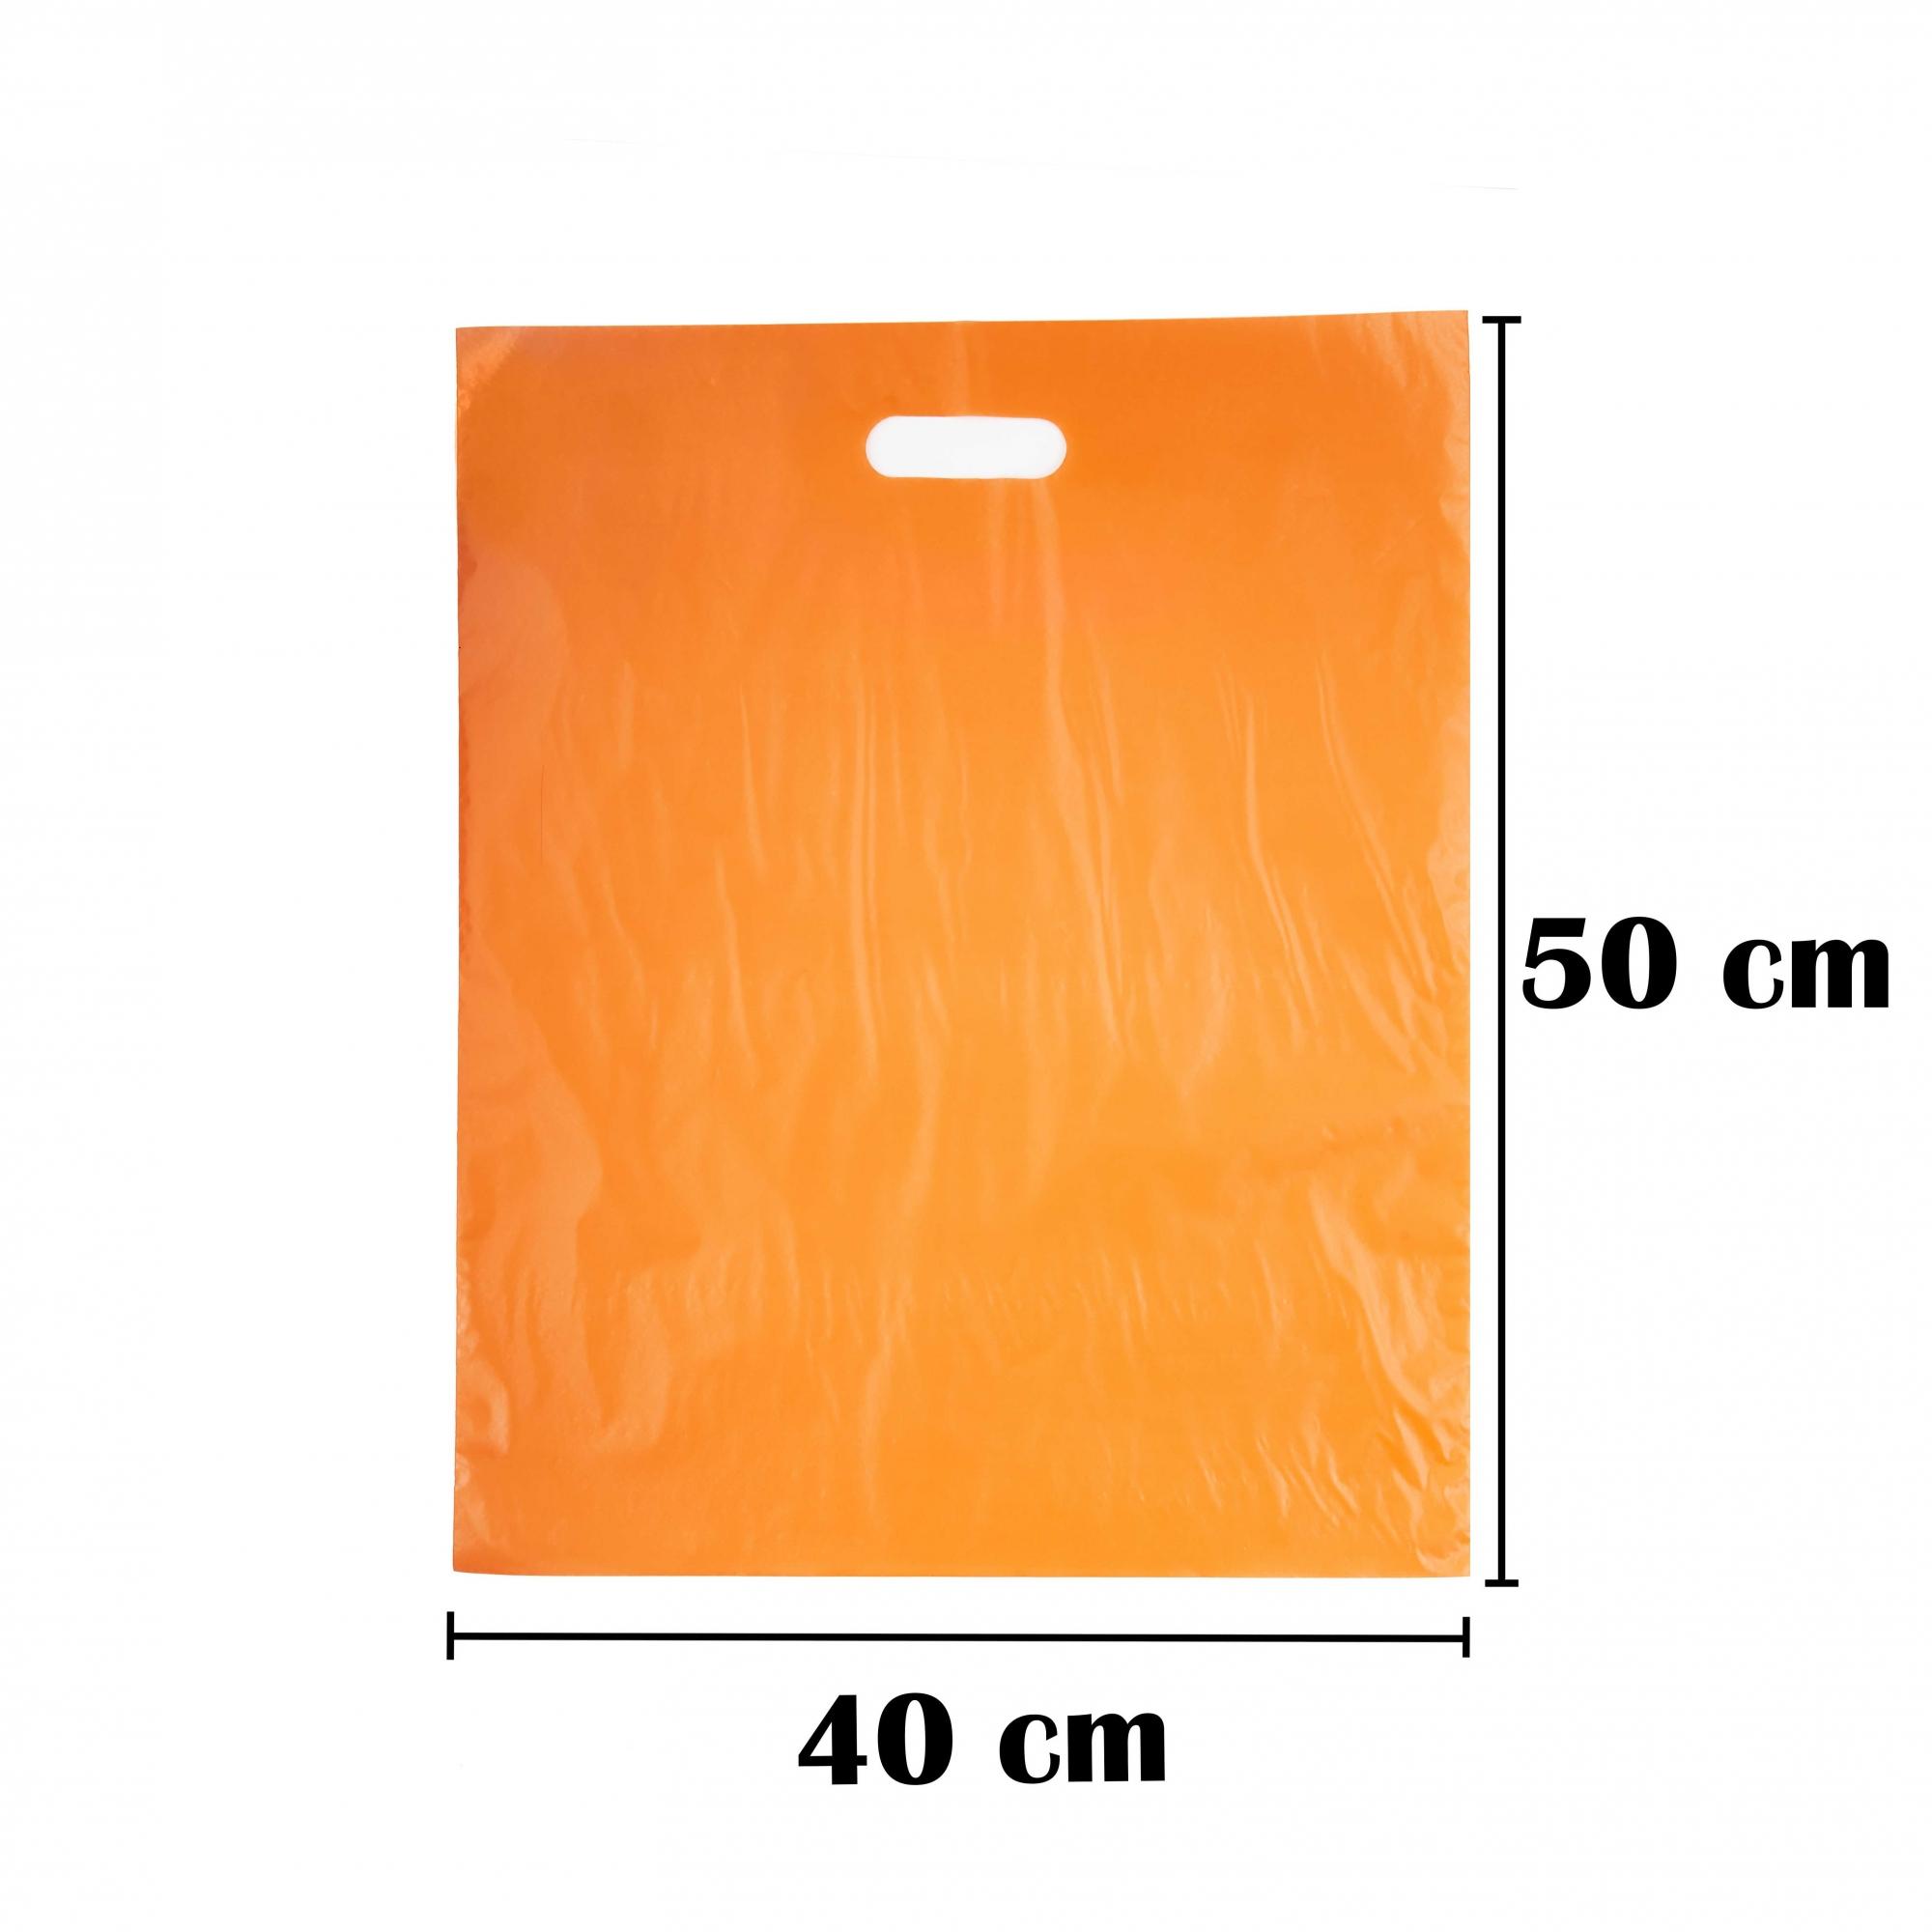 Sacola Plástica 40x50 Laranja Alça Boca de Palhaço 1.000 Unidades